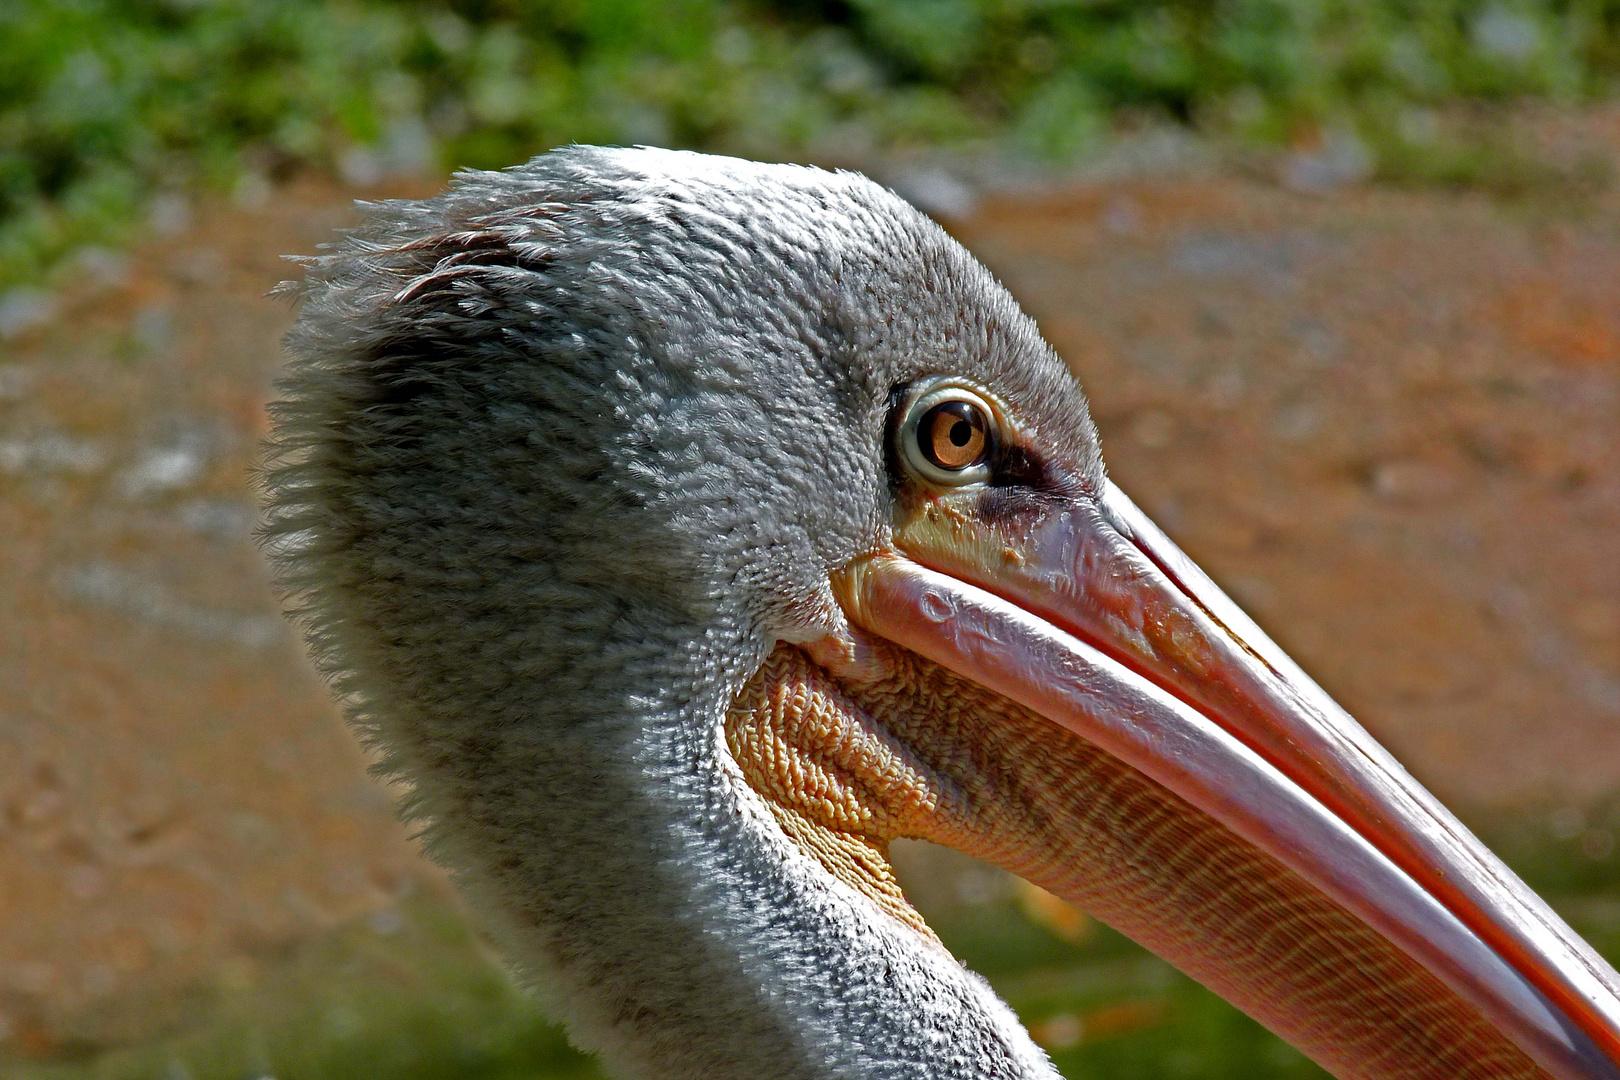 Pelikankopf (Neuwieder Zoo)